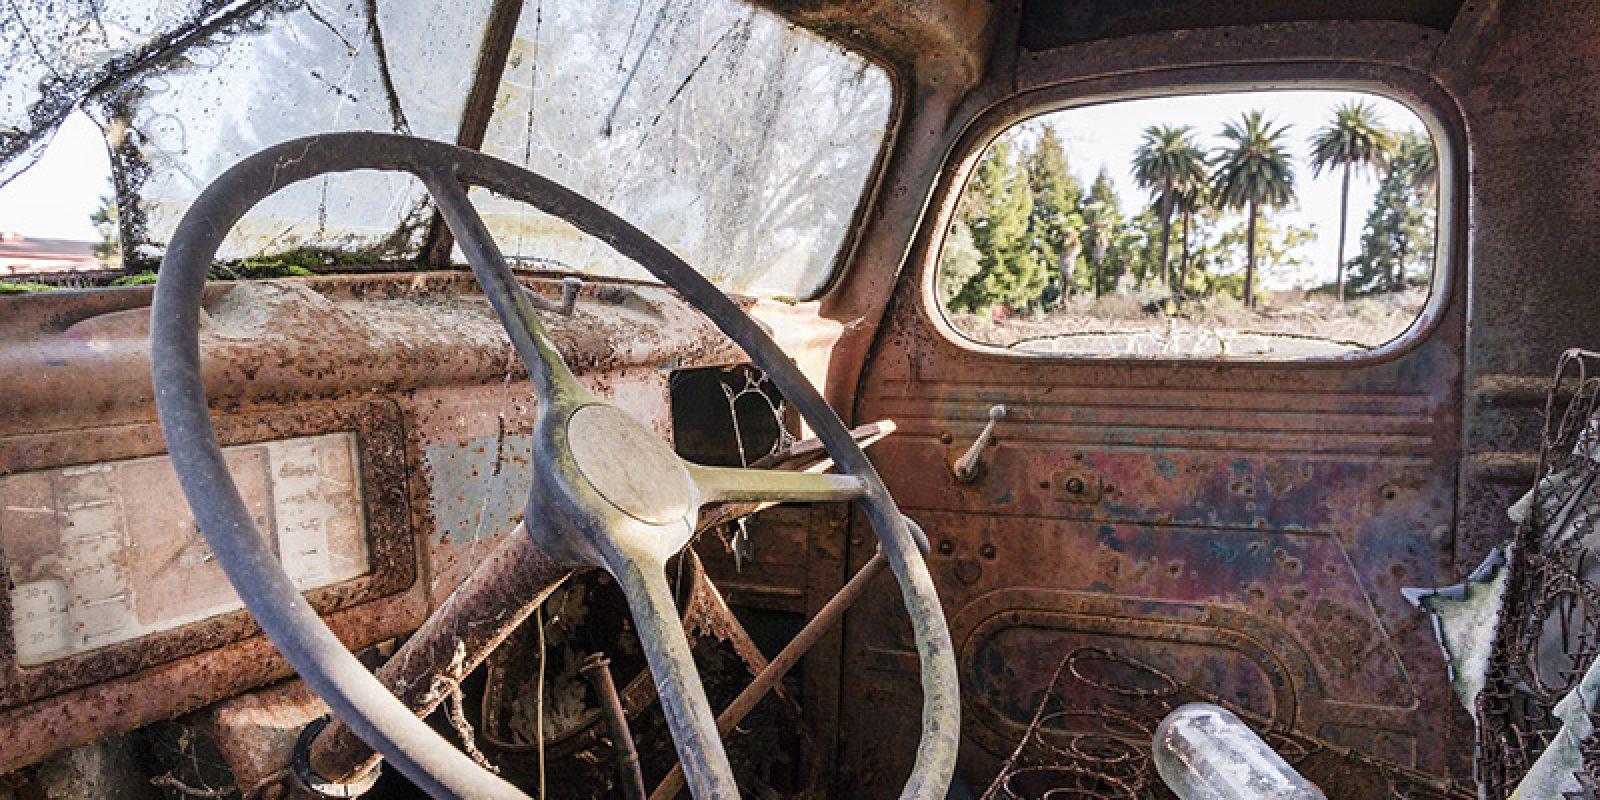 truck-1655615_1920